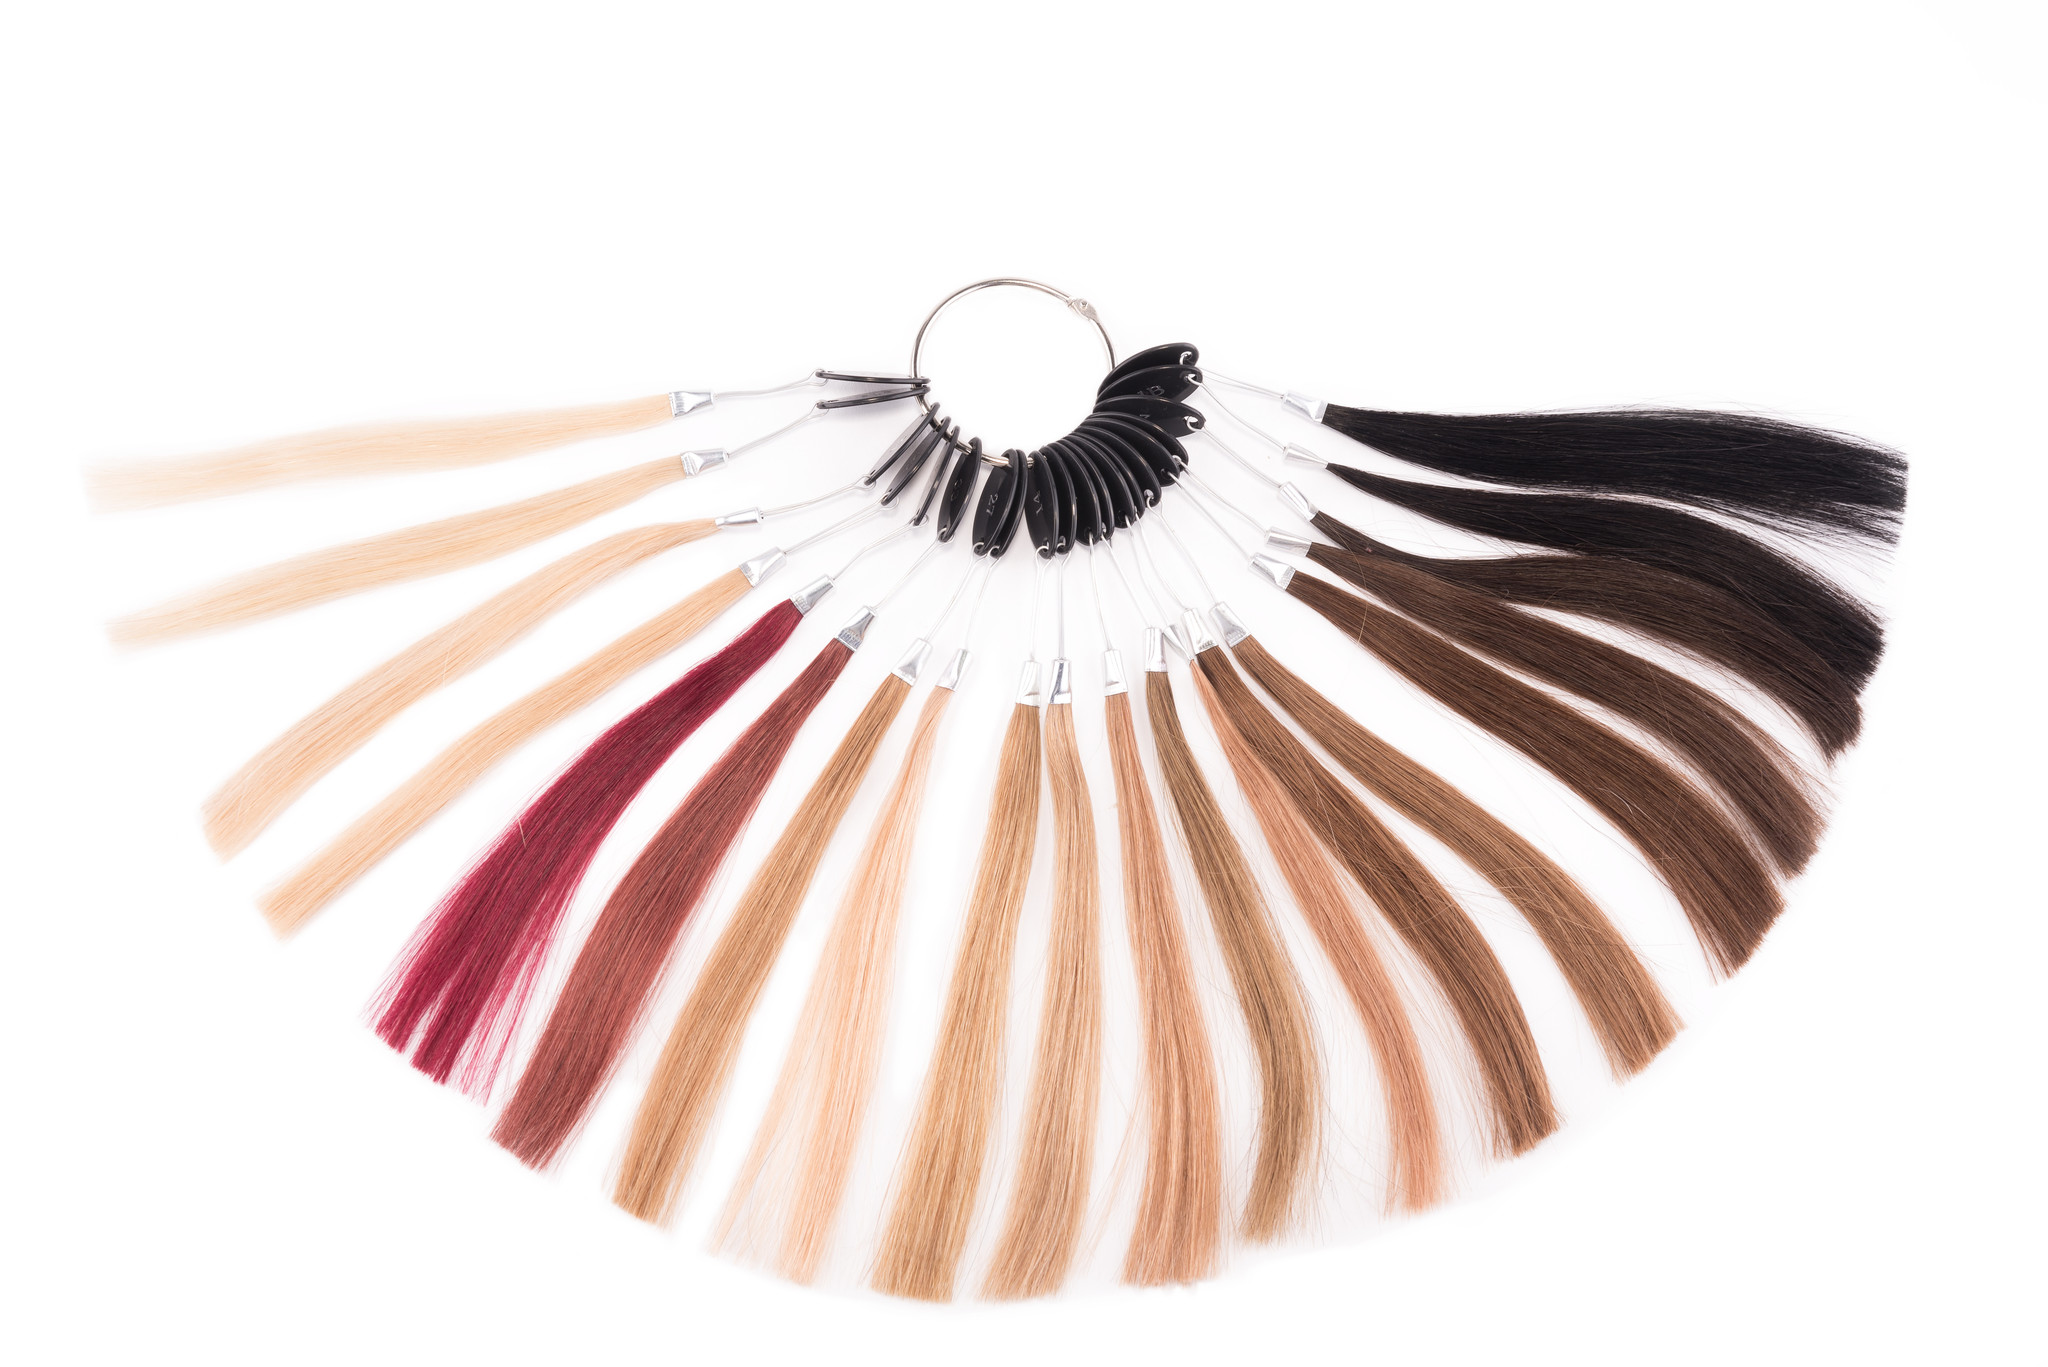 Hairextensions kleurenring